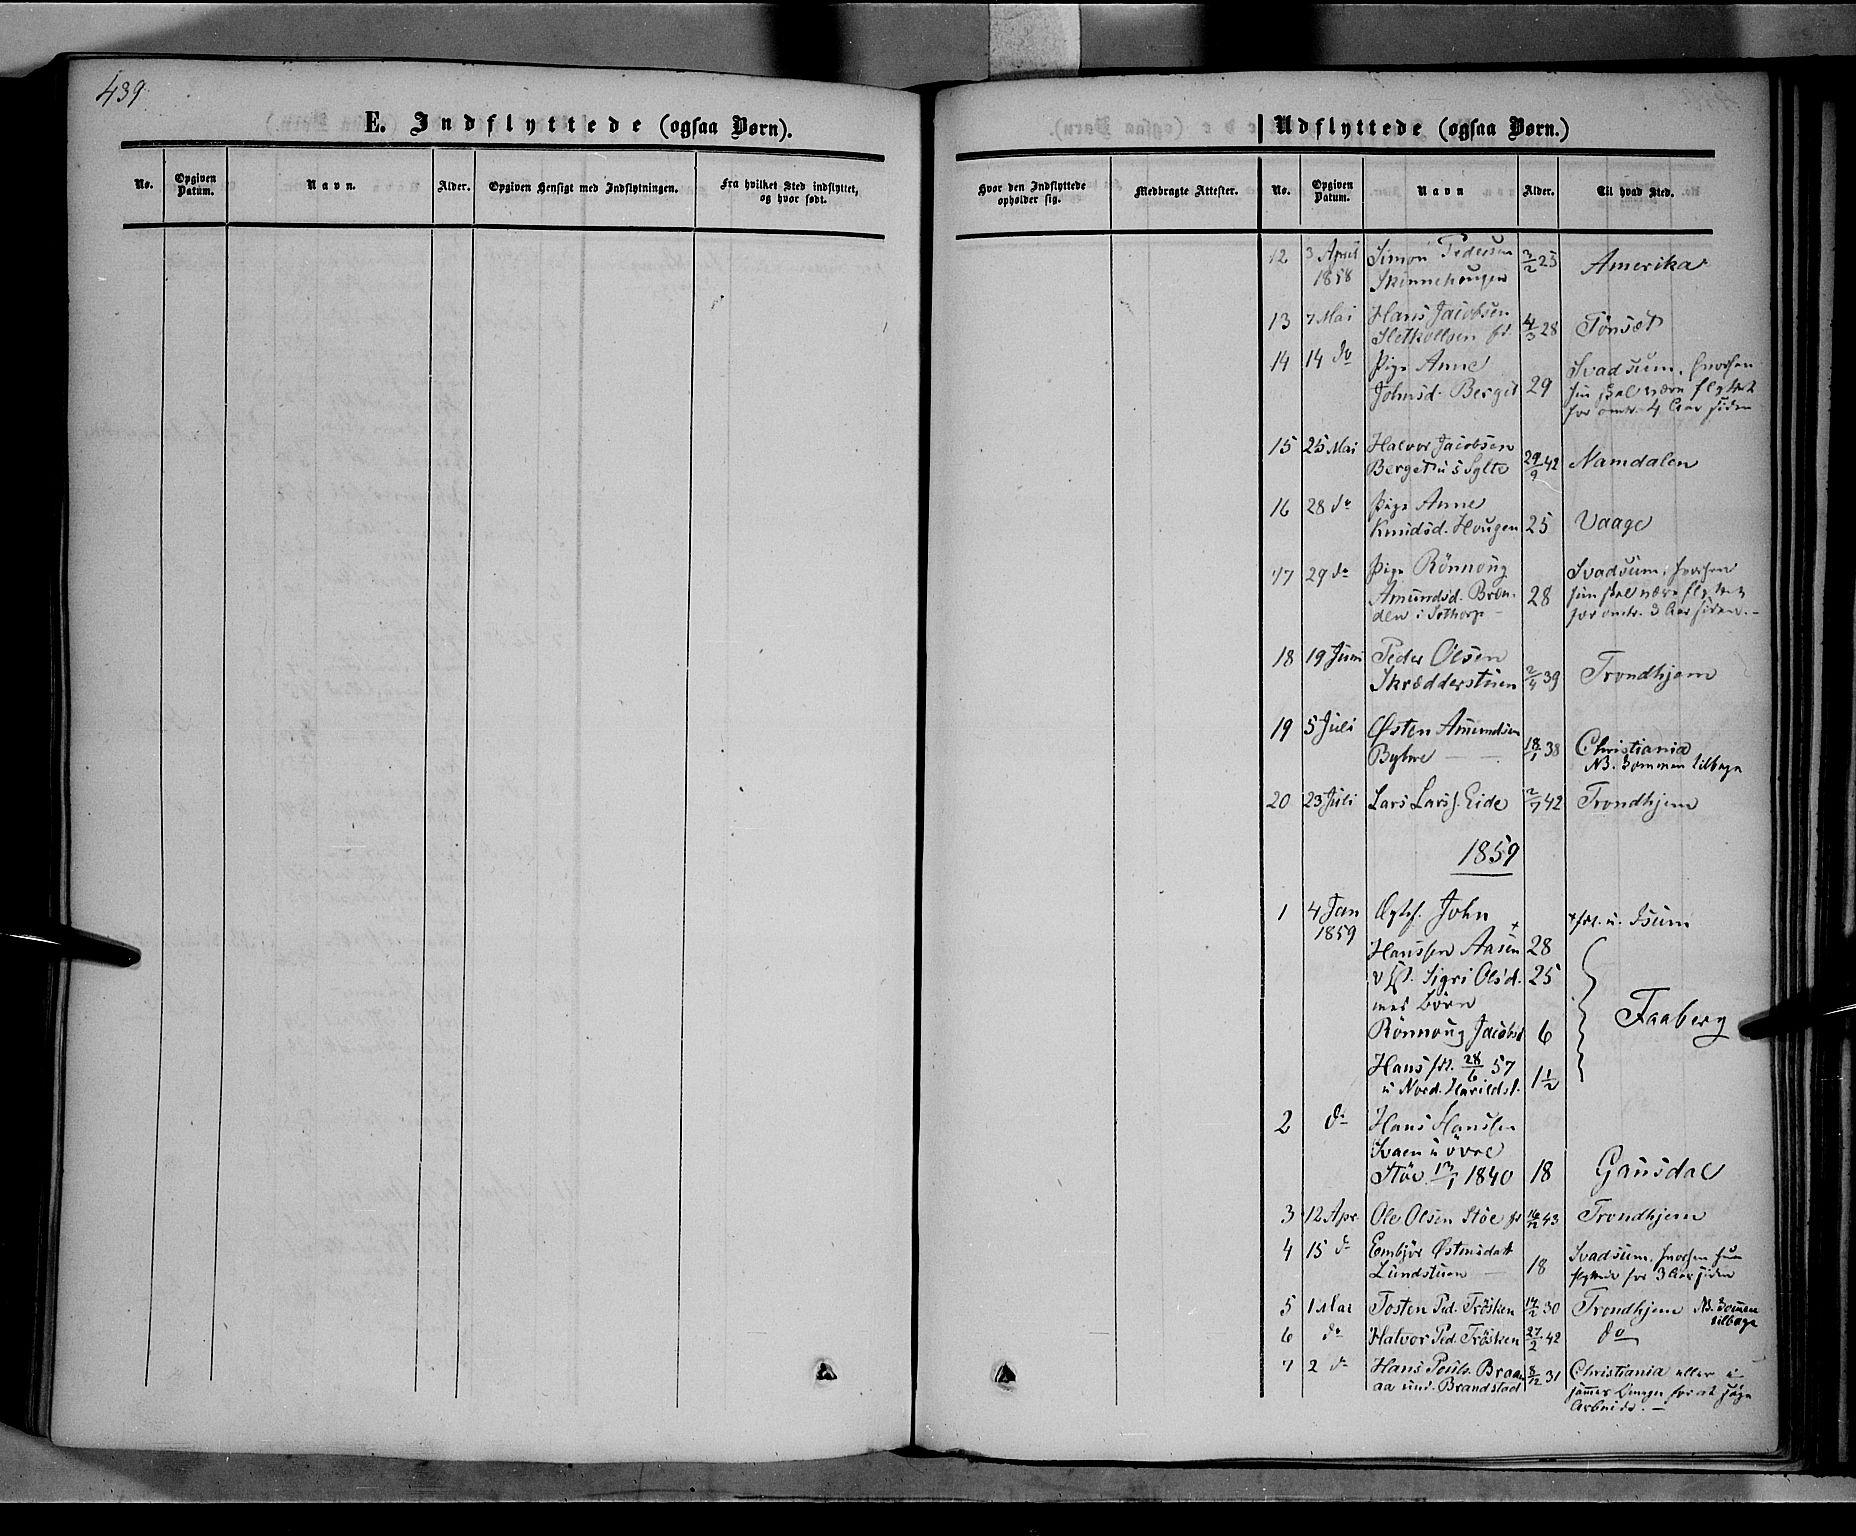 SAH, Nord-Fron prestekontor, Ministerialbok nr. 1, 1851-1864, s. 439